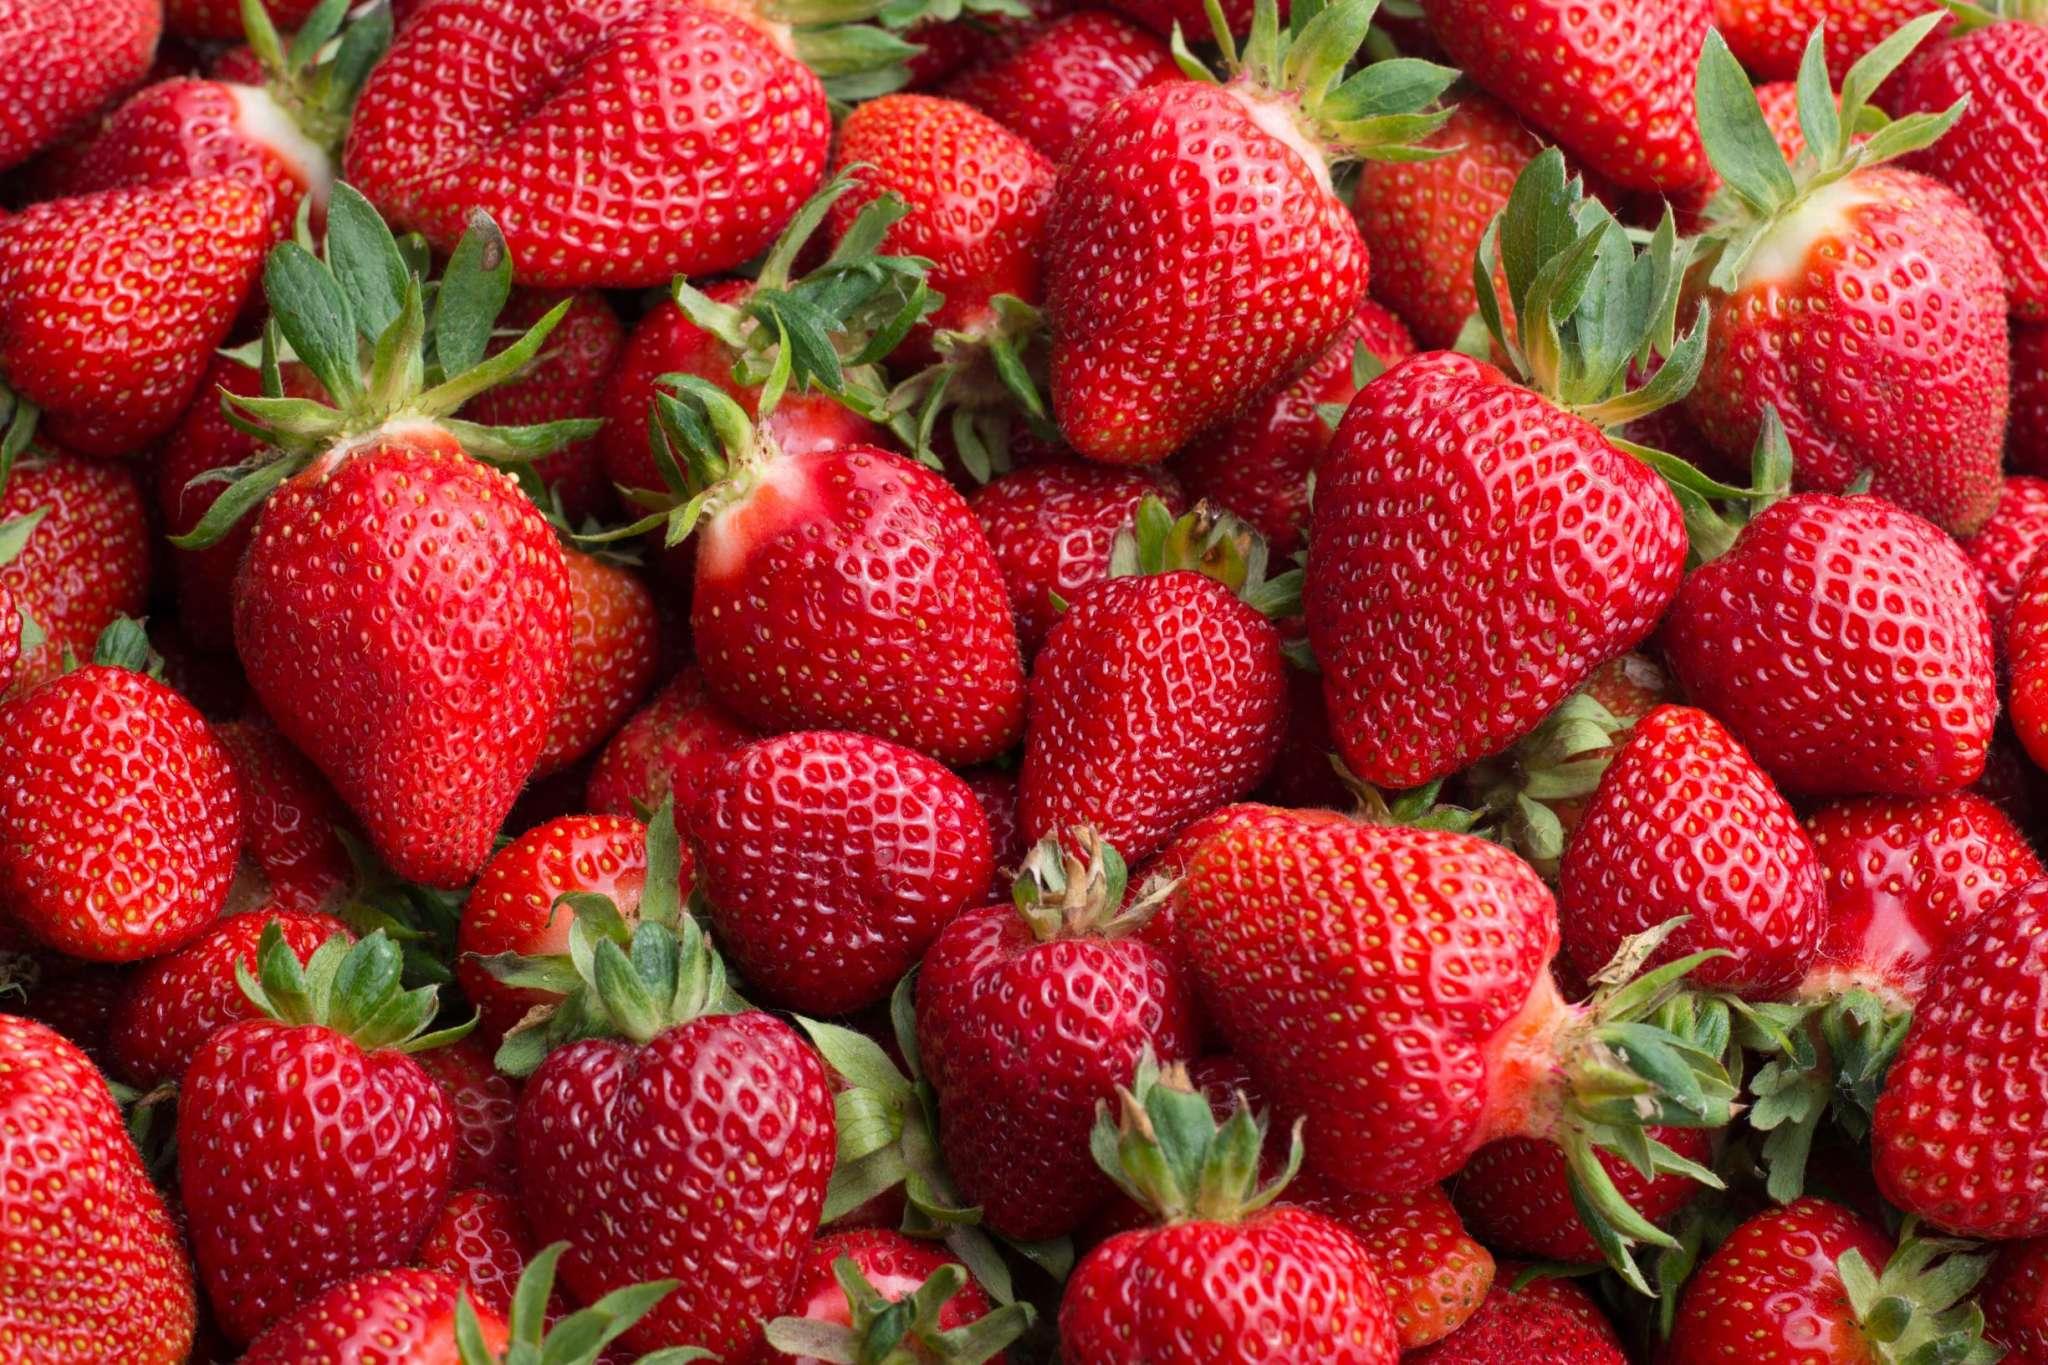 Camino Real Strawberry